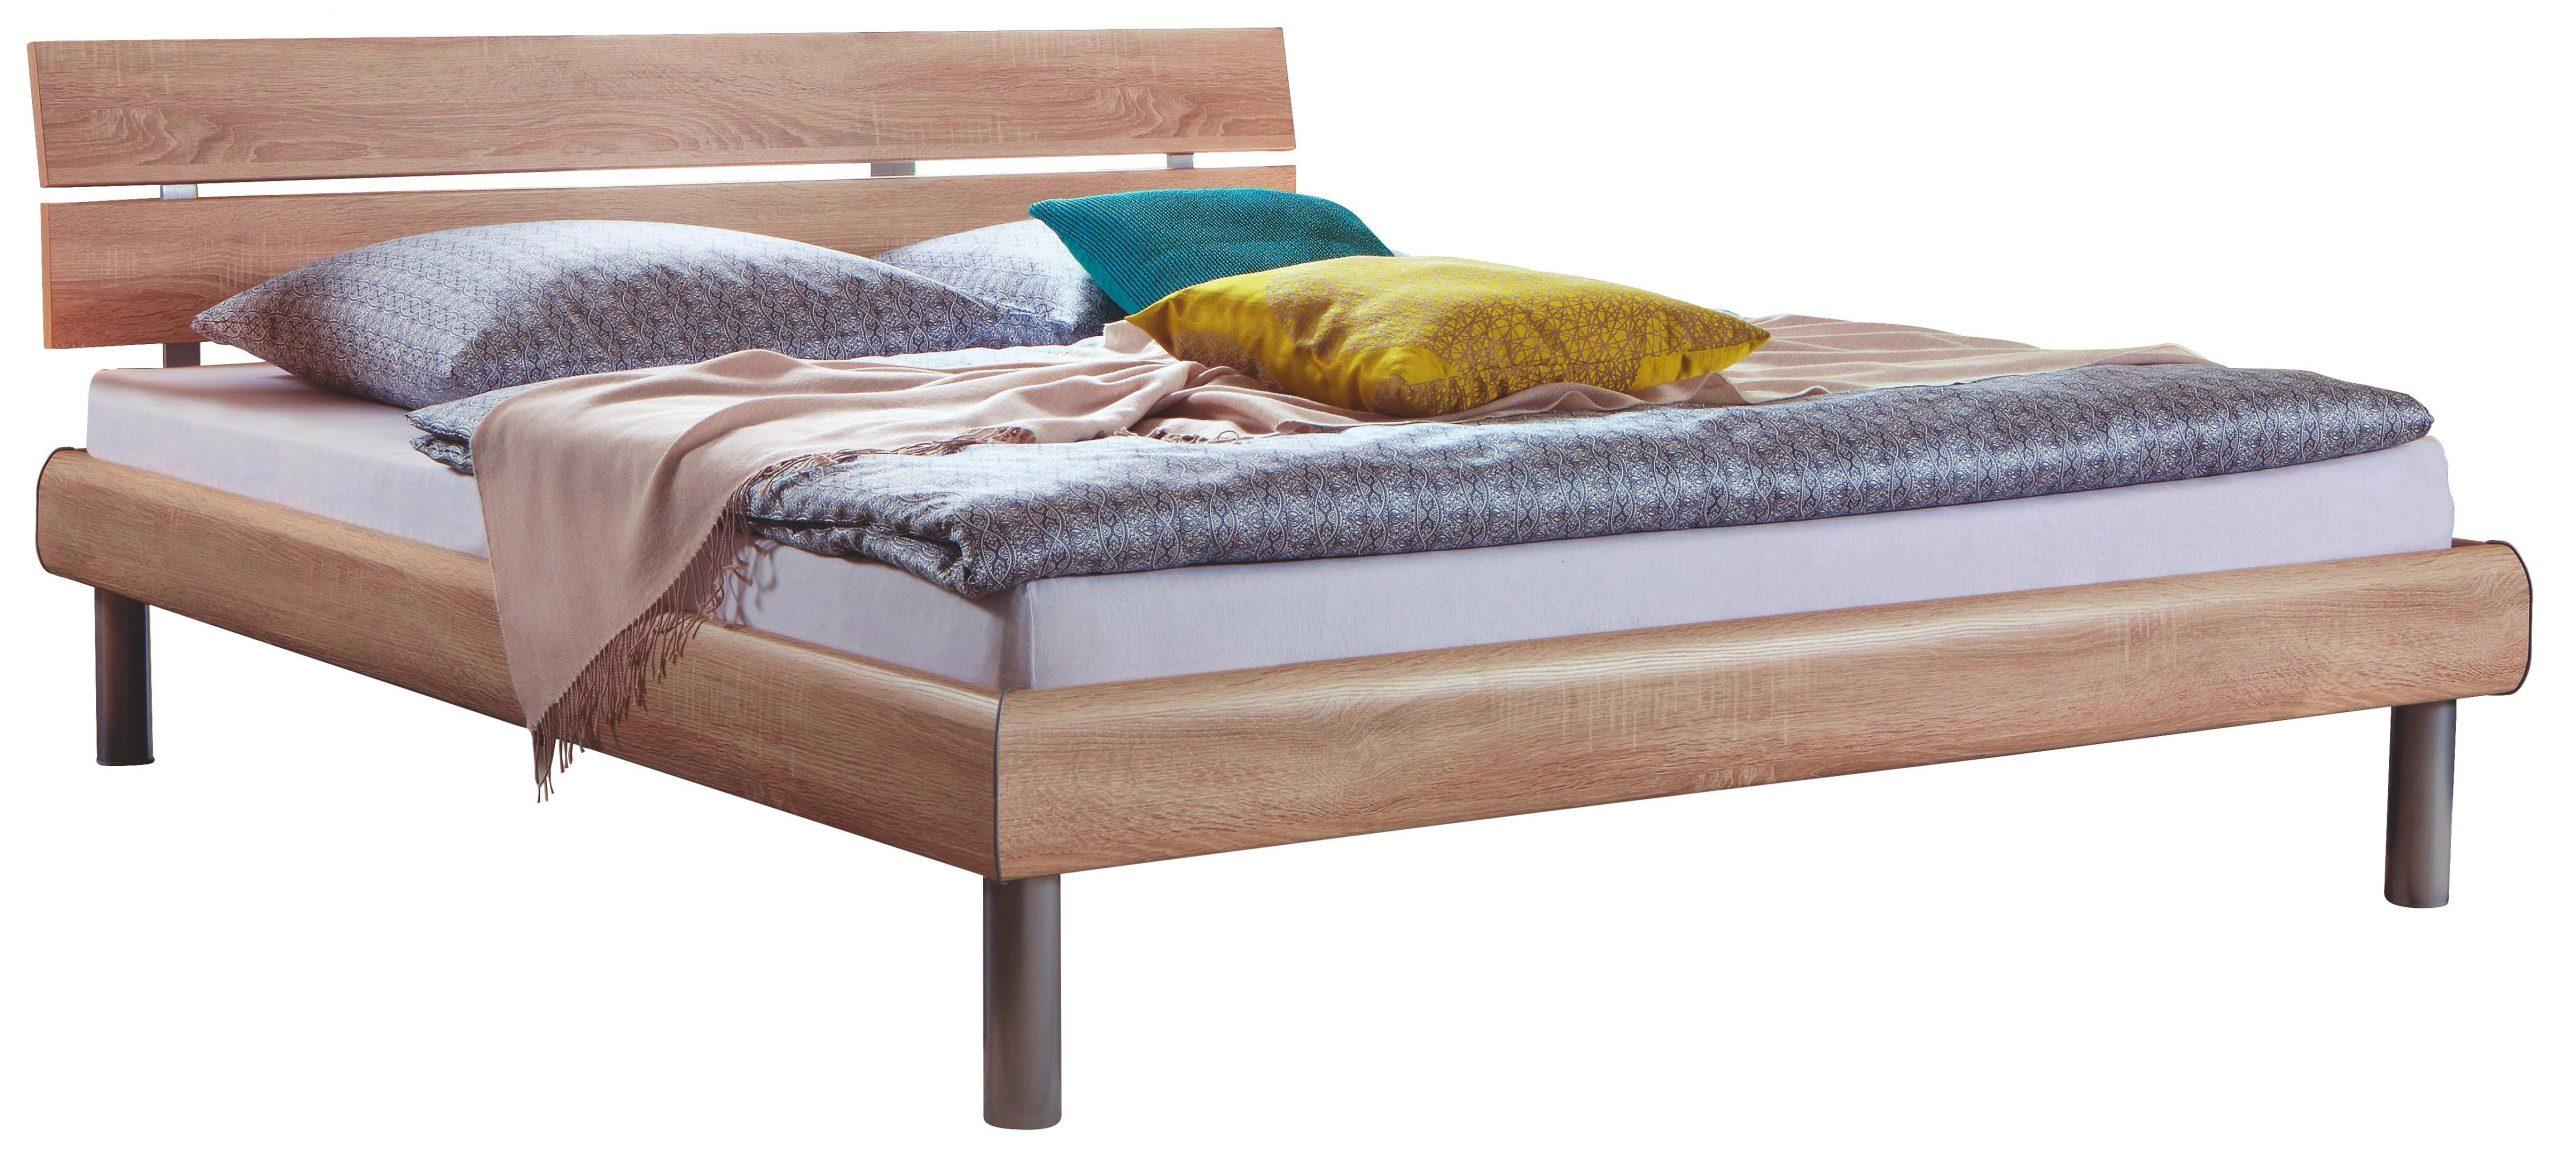 Full Size of Ausziehbares Bett Mit Stauraum Eiche Cars 180x200 Runde Betten Rattan Stabiles Weiß Holz Kopfteil Bambus Bett Bett 160x220